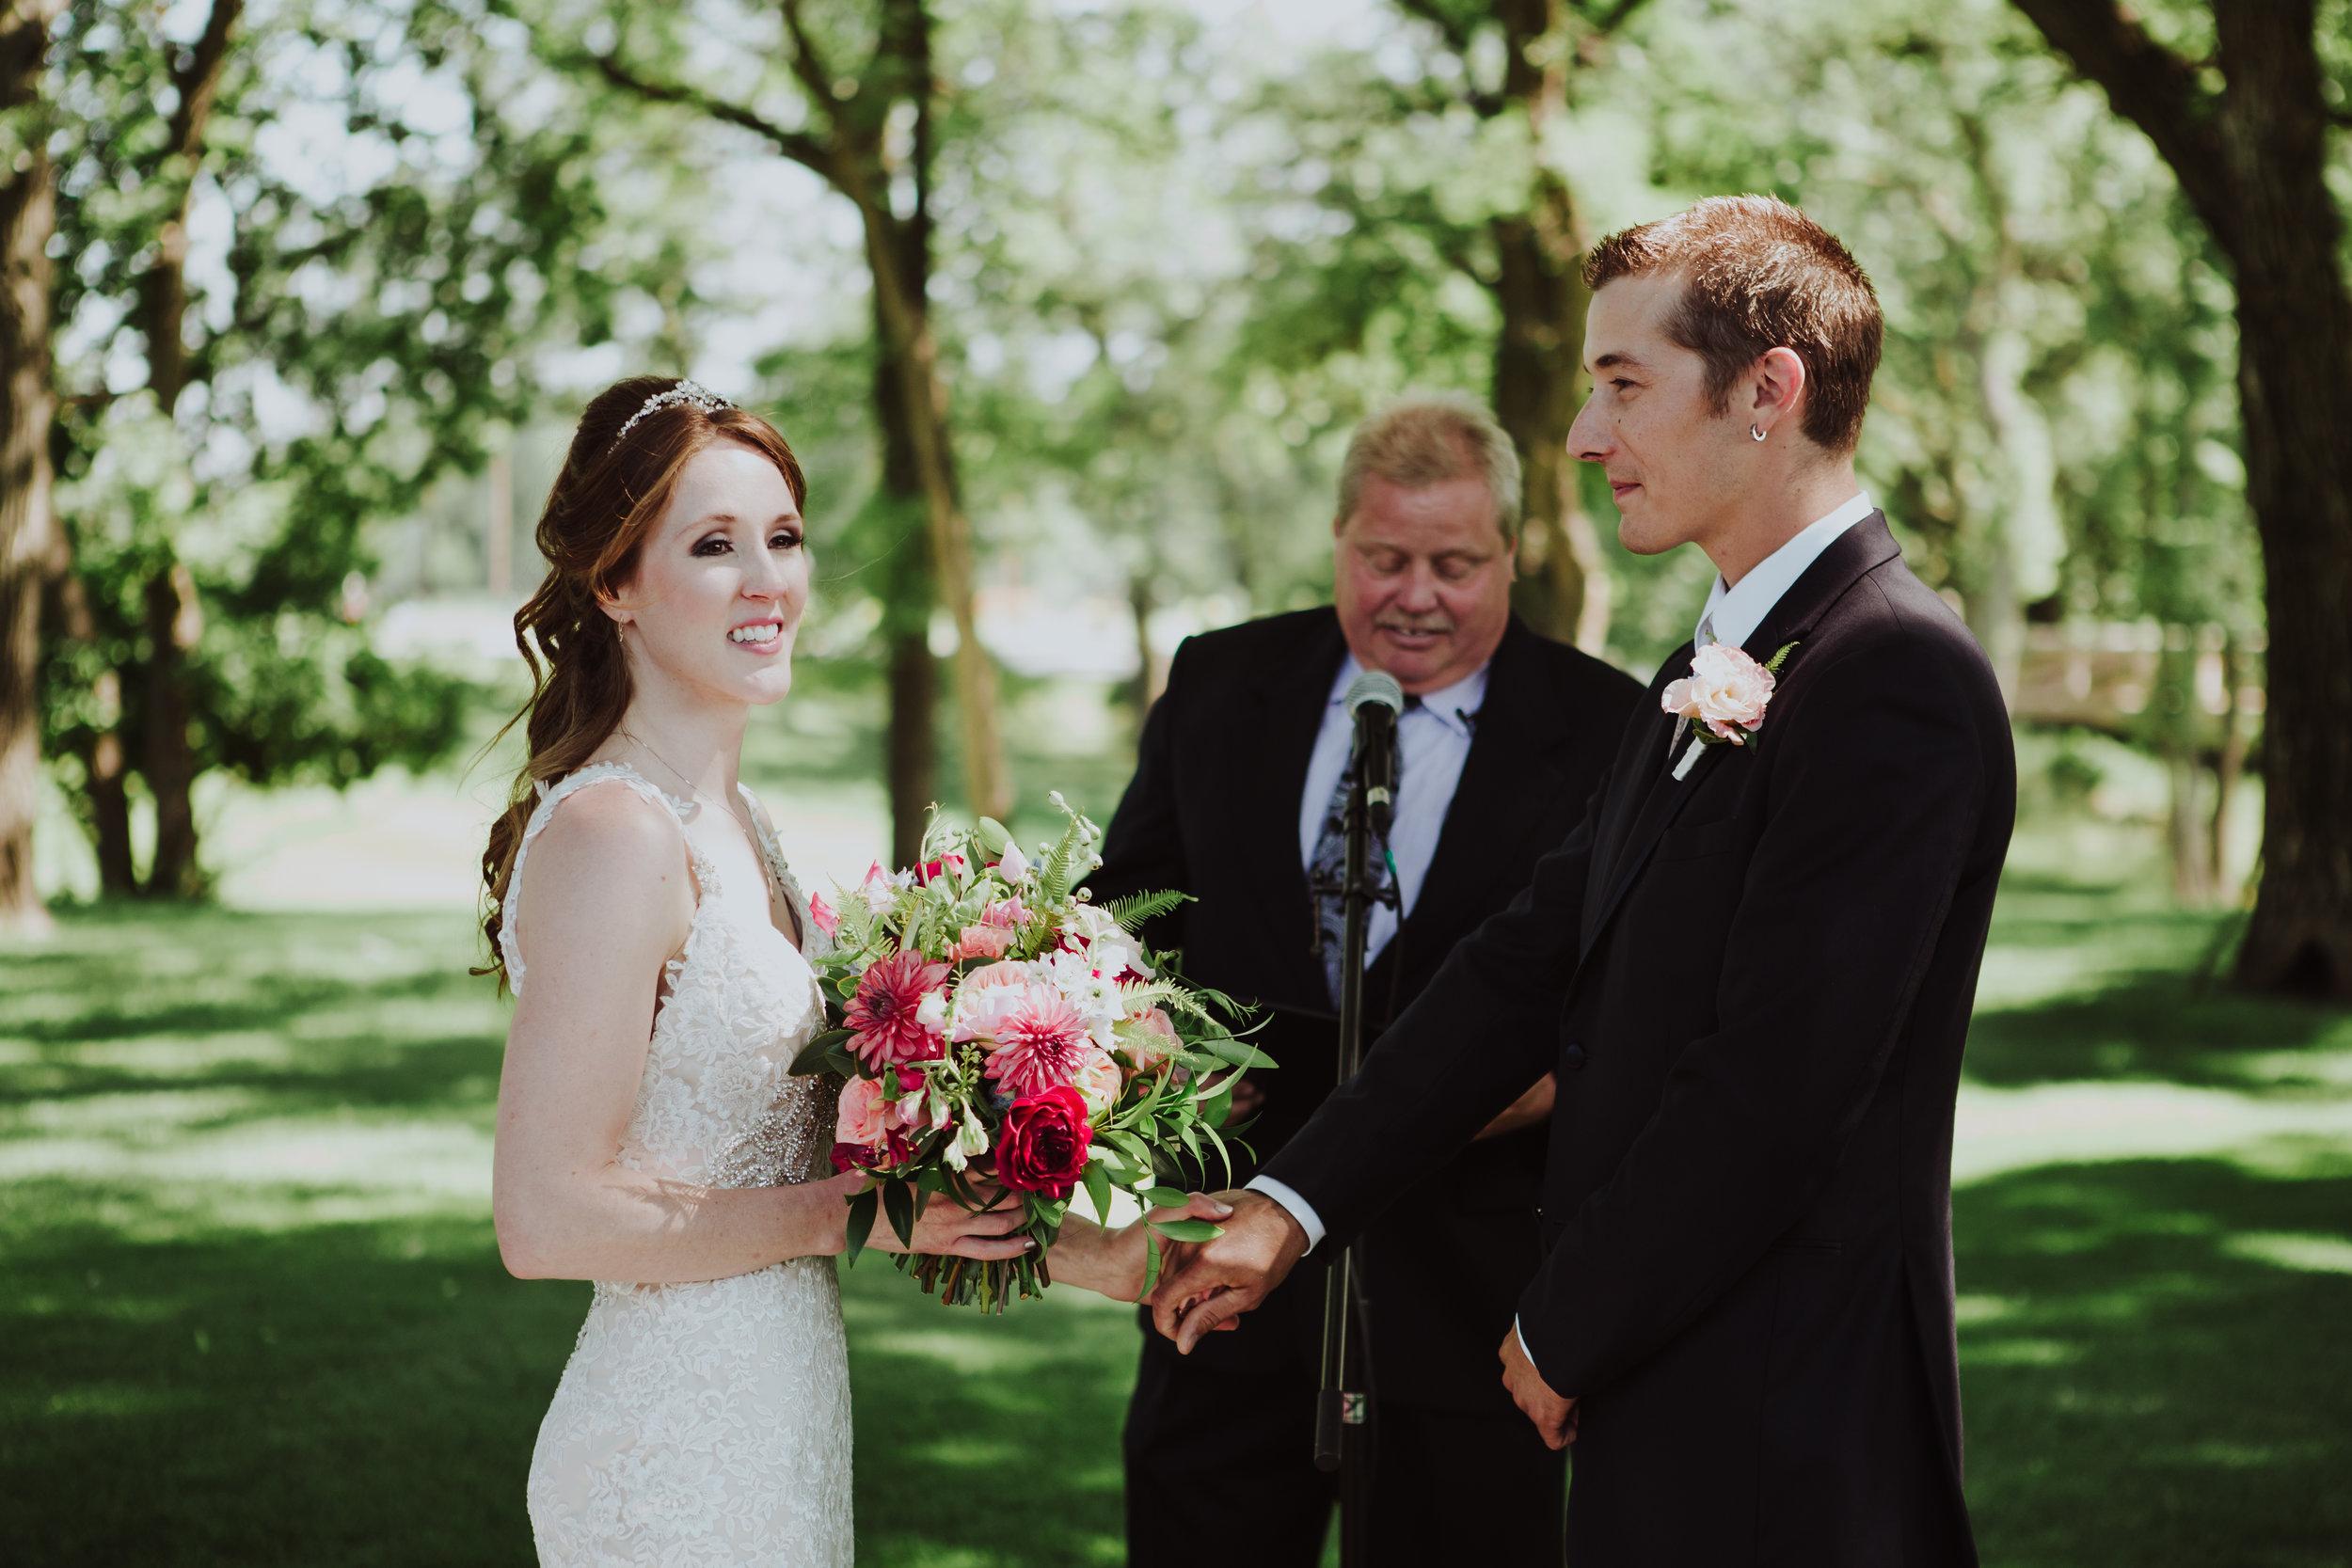 Wedding Florists Winnipeg - Outdoor Wedding Ceremony